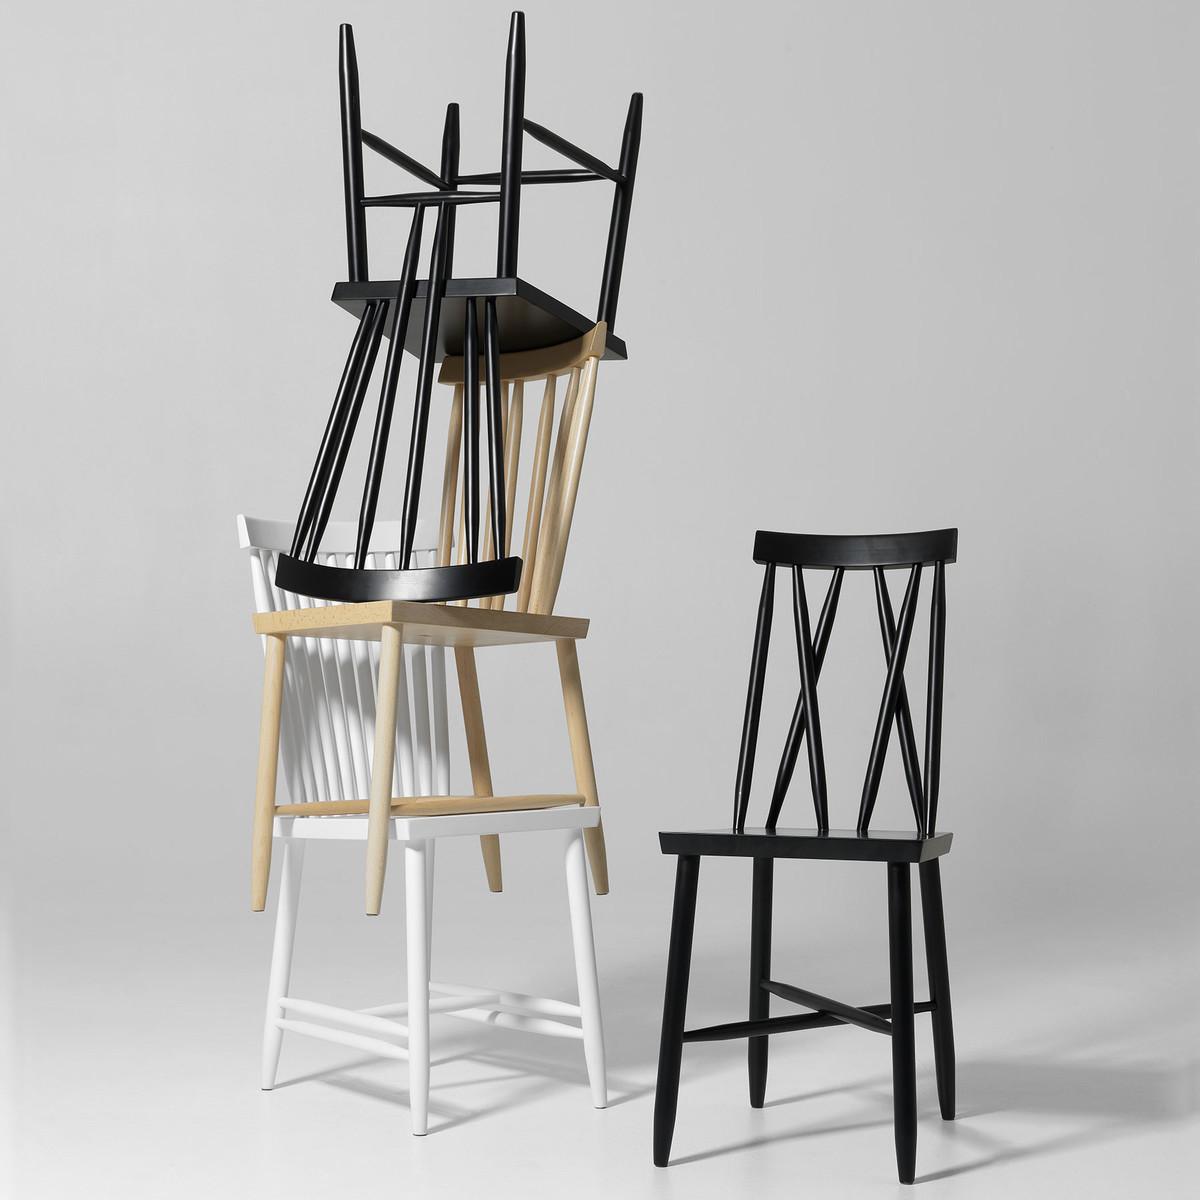 Design Stockholm Chair No2Schwarz House Family 2W9IEDH